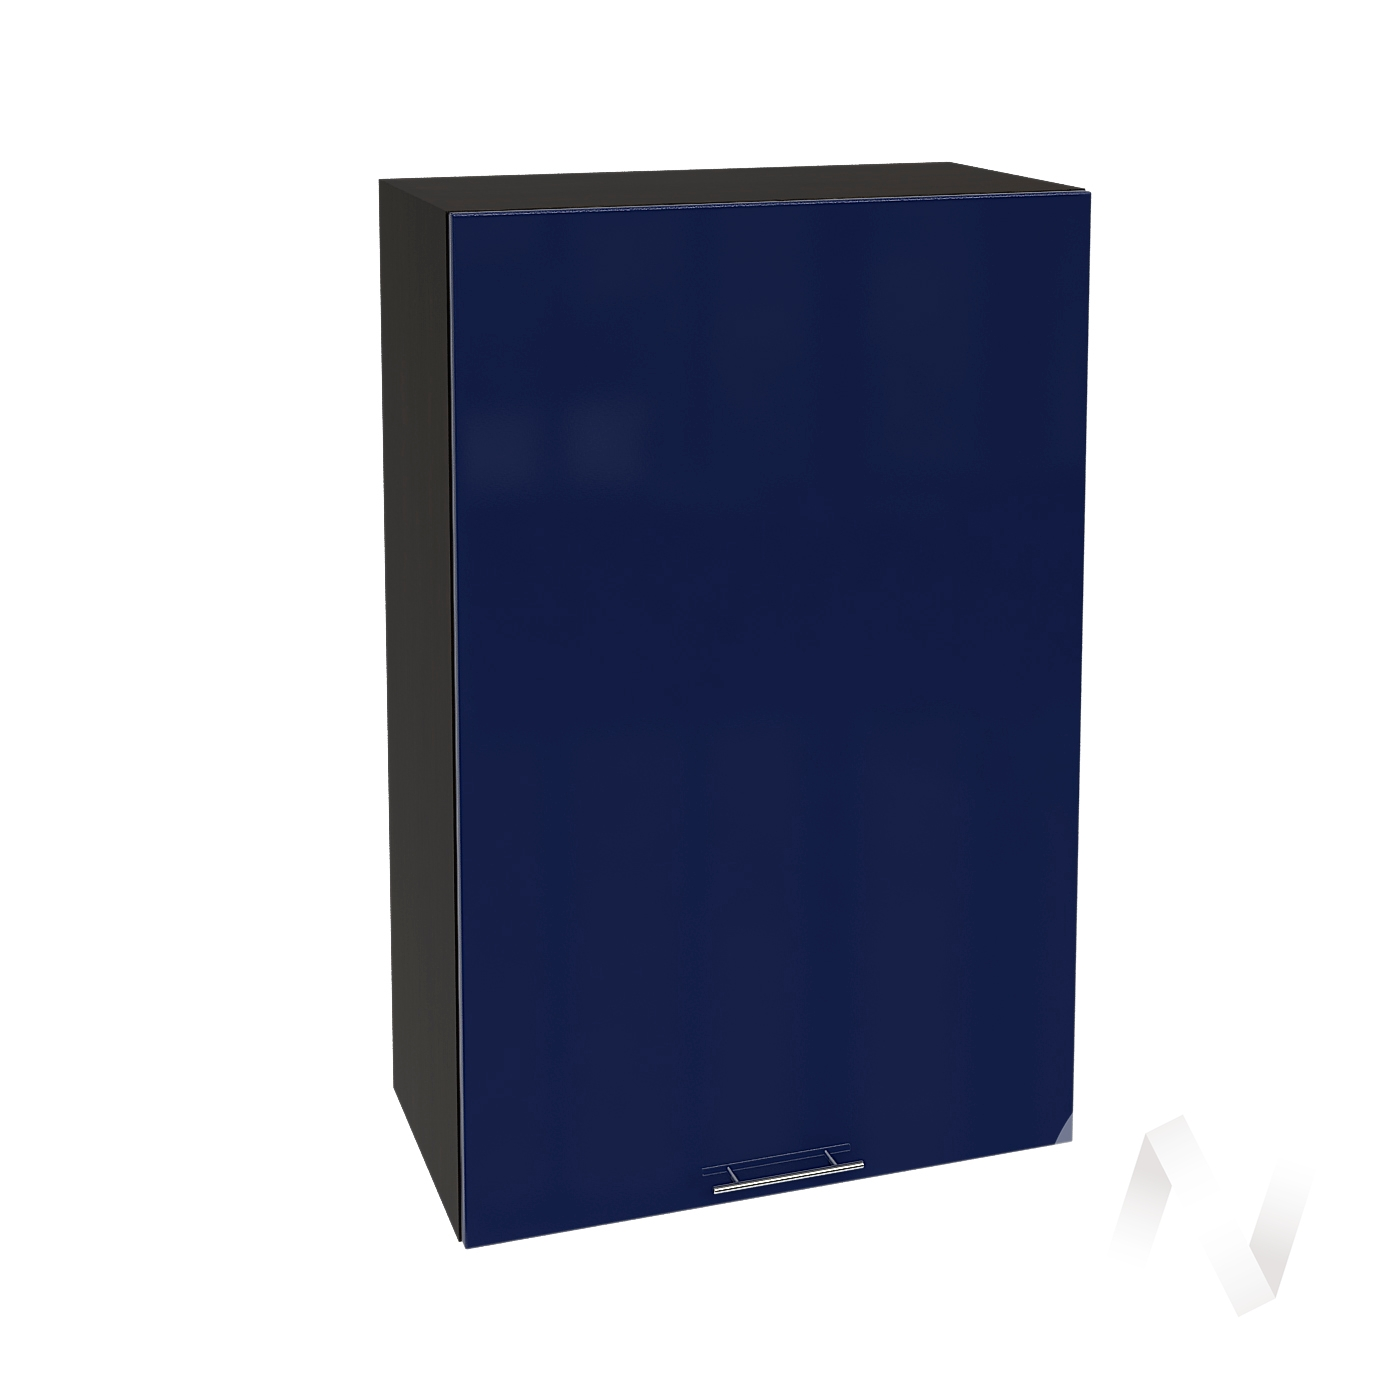 "Кухня ""Валерия-М"": Шкаф верхний 609, ШВ 609М (Синий глянец/корпус венге)"